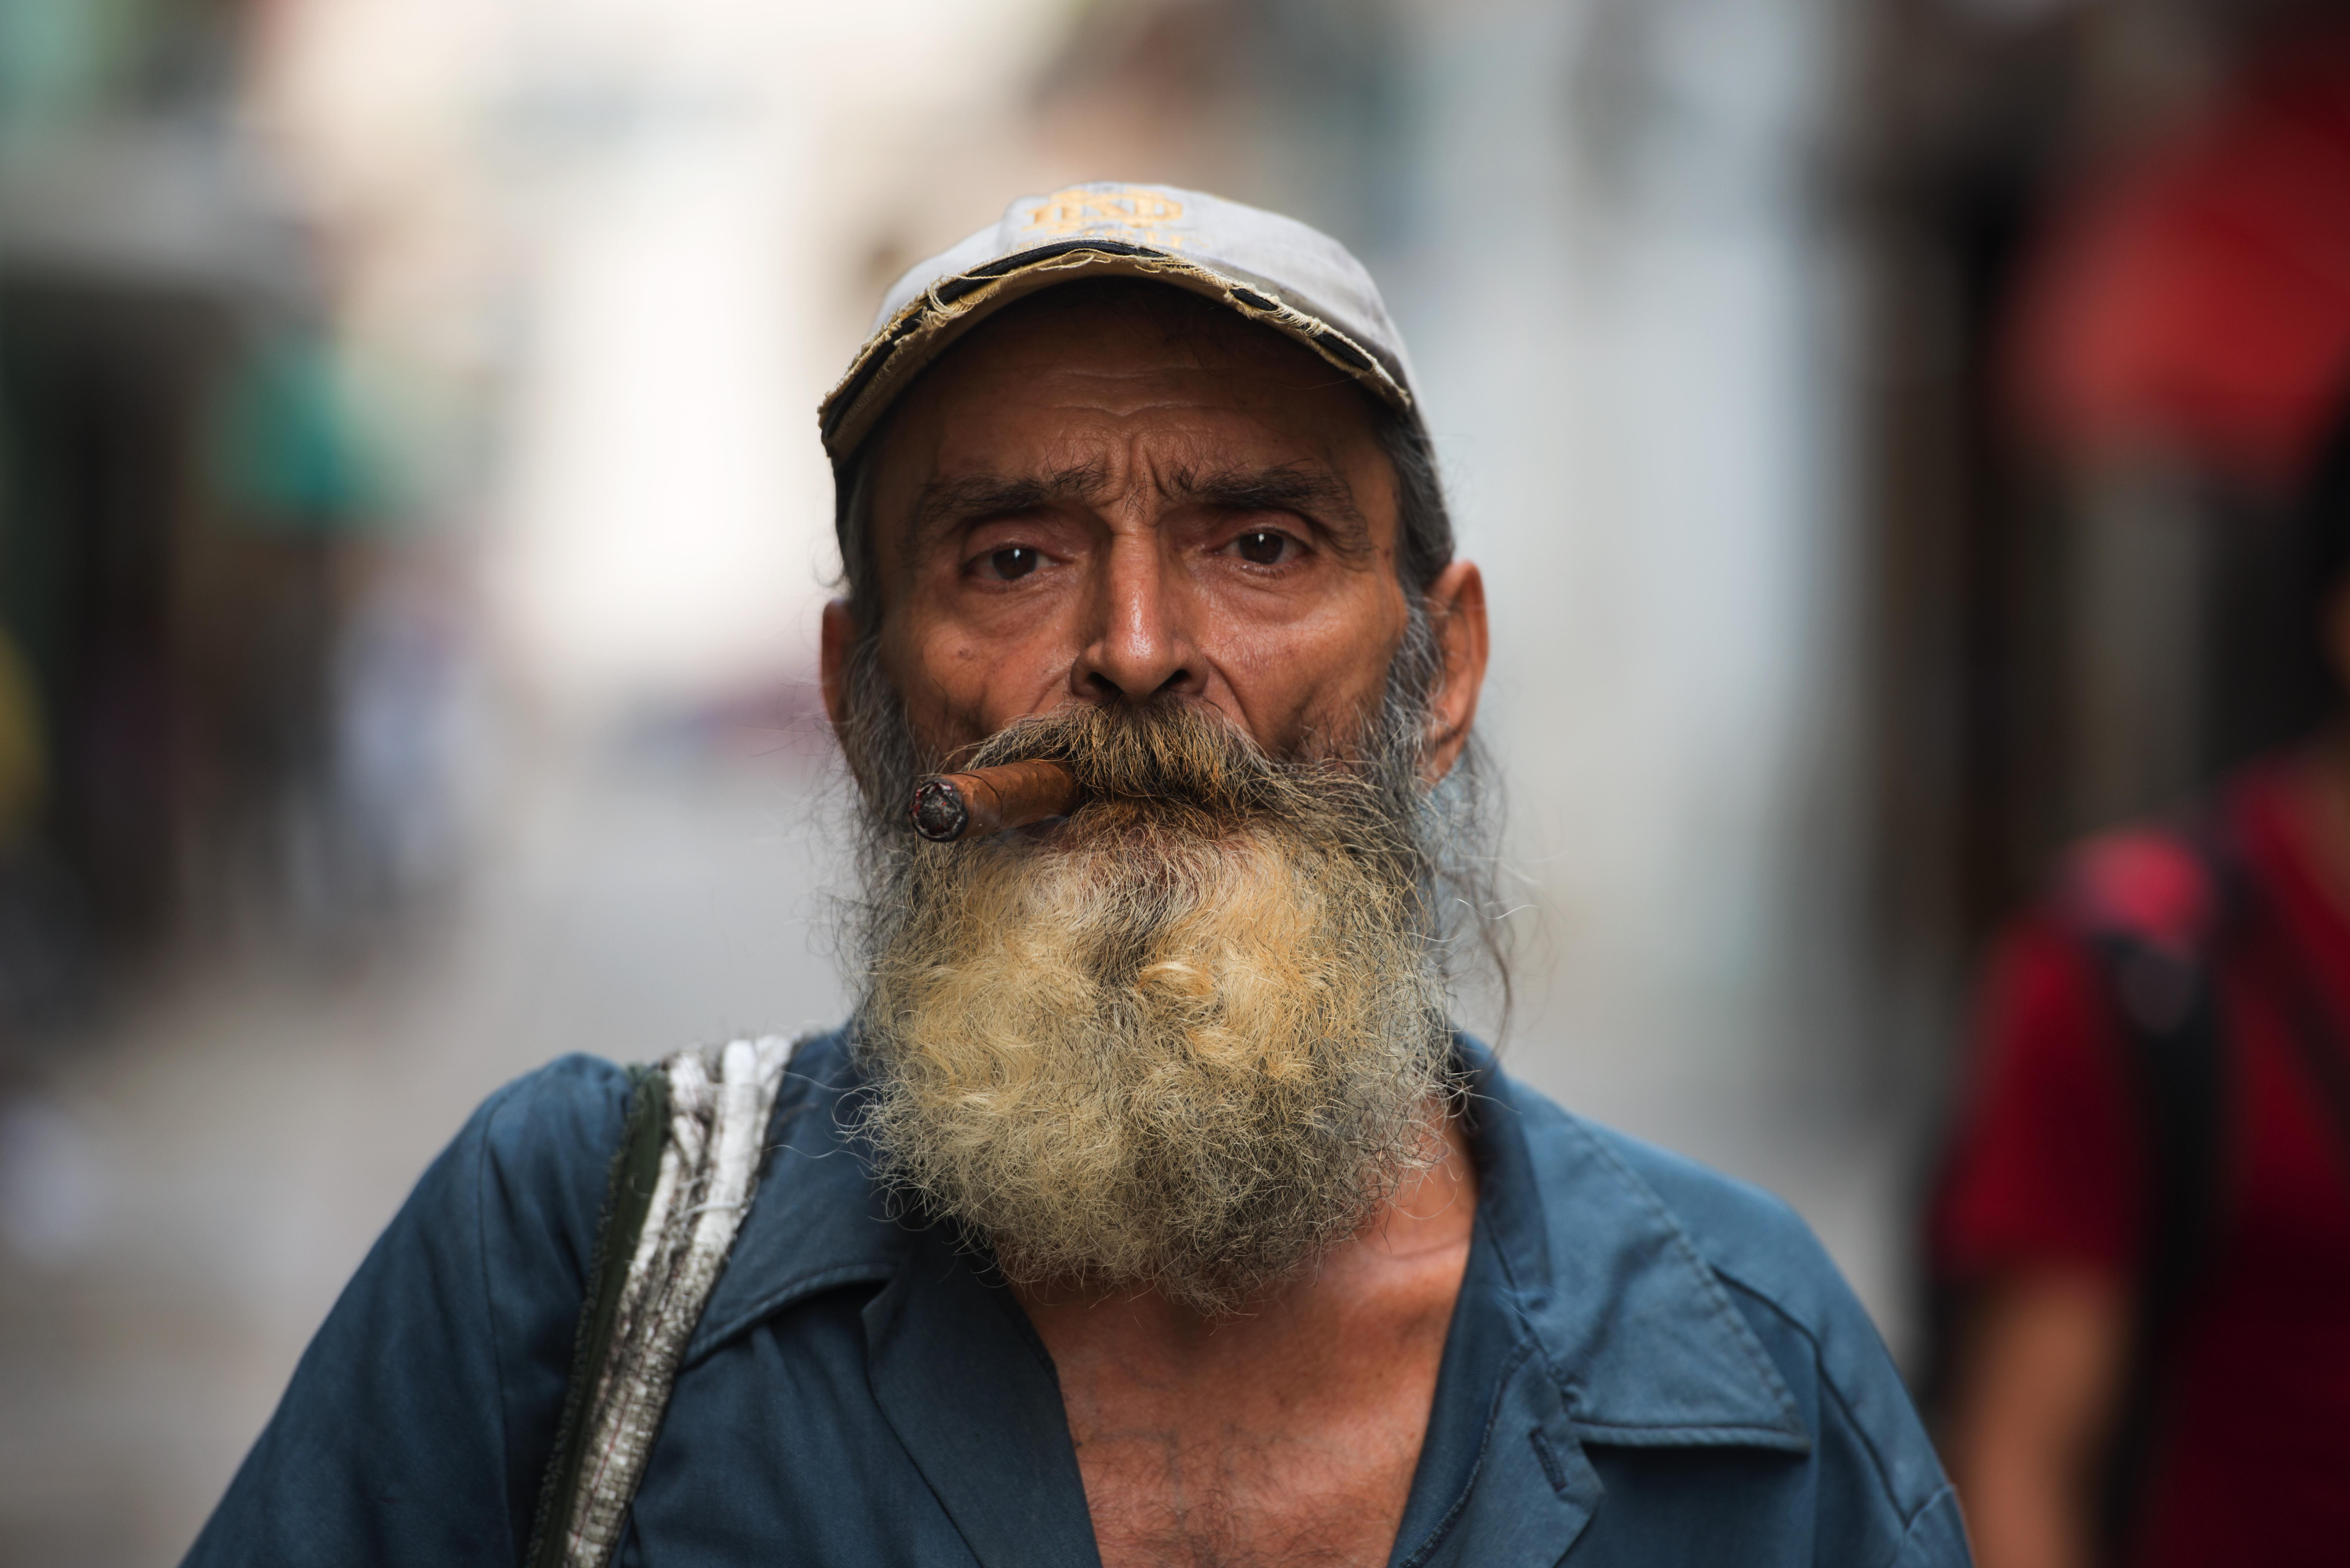 Habana Newspaper man